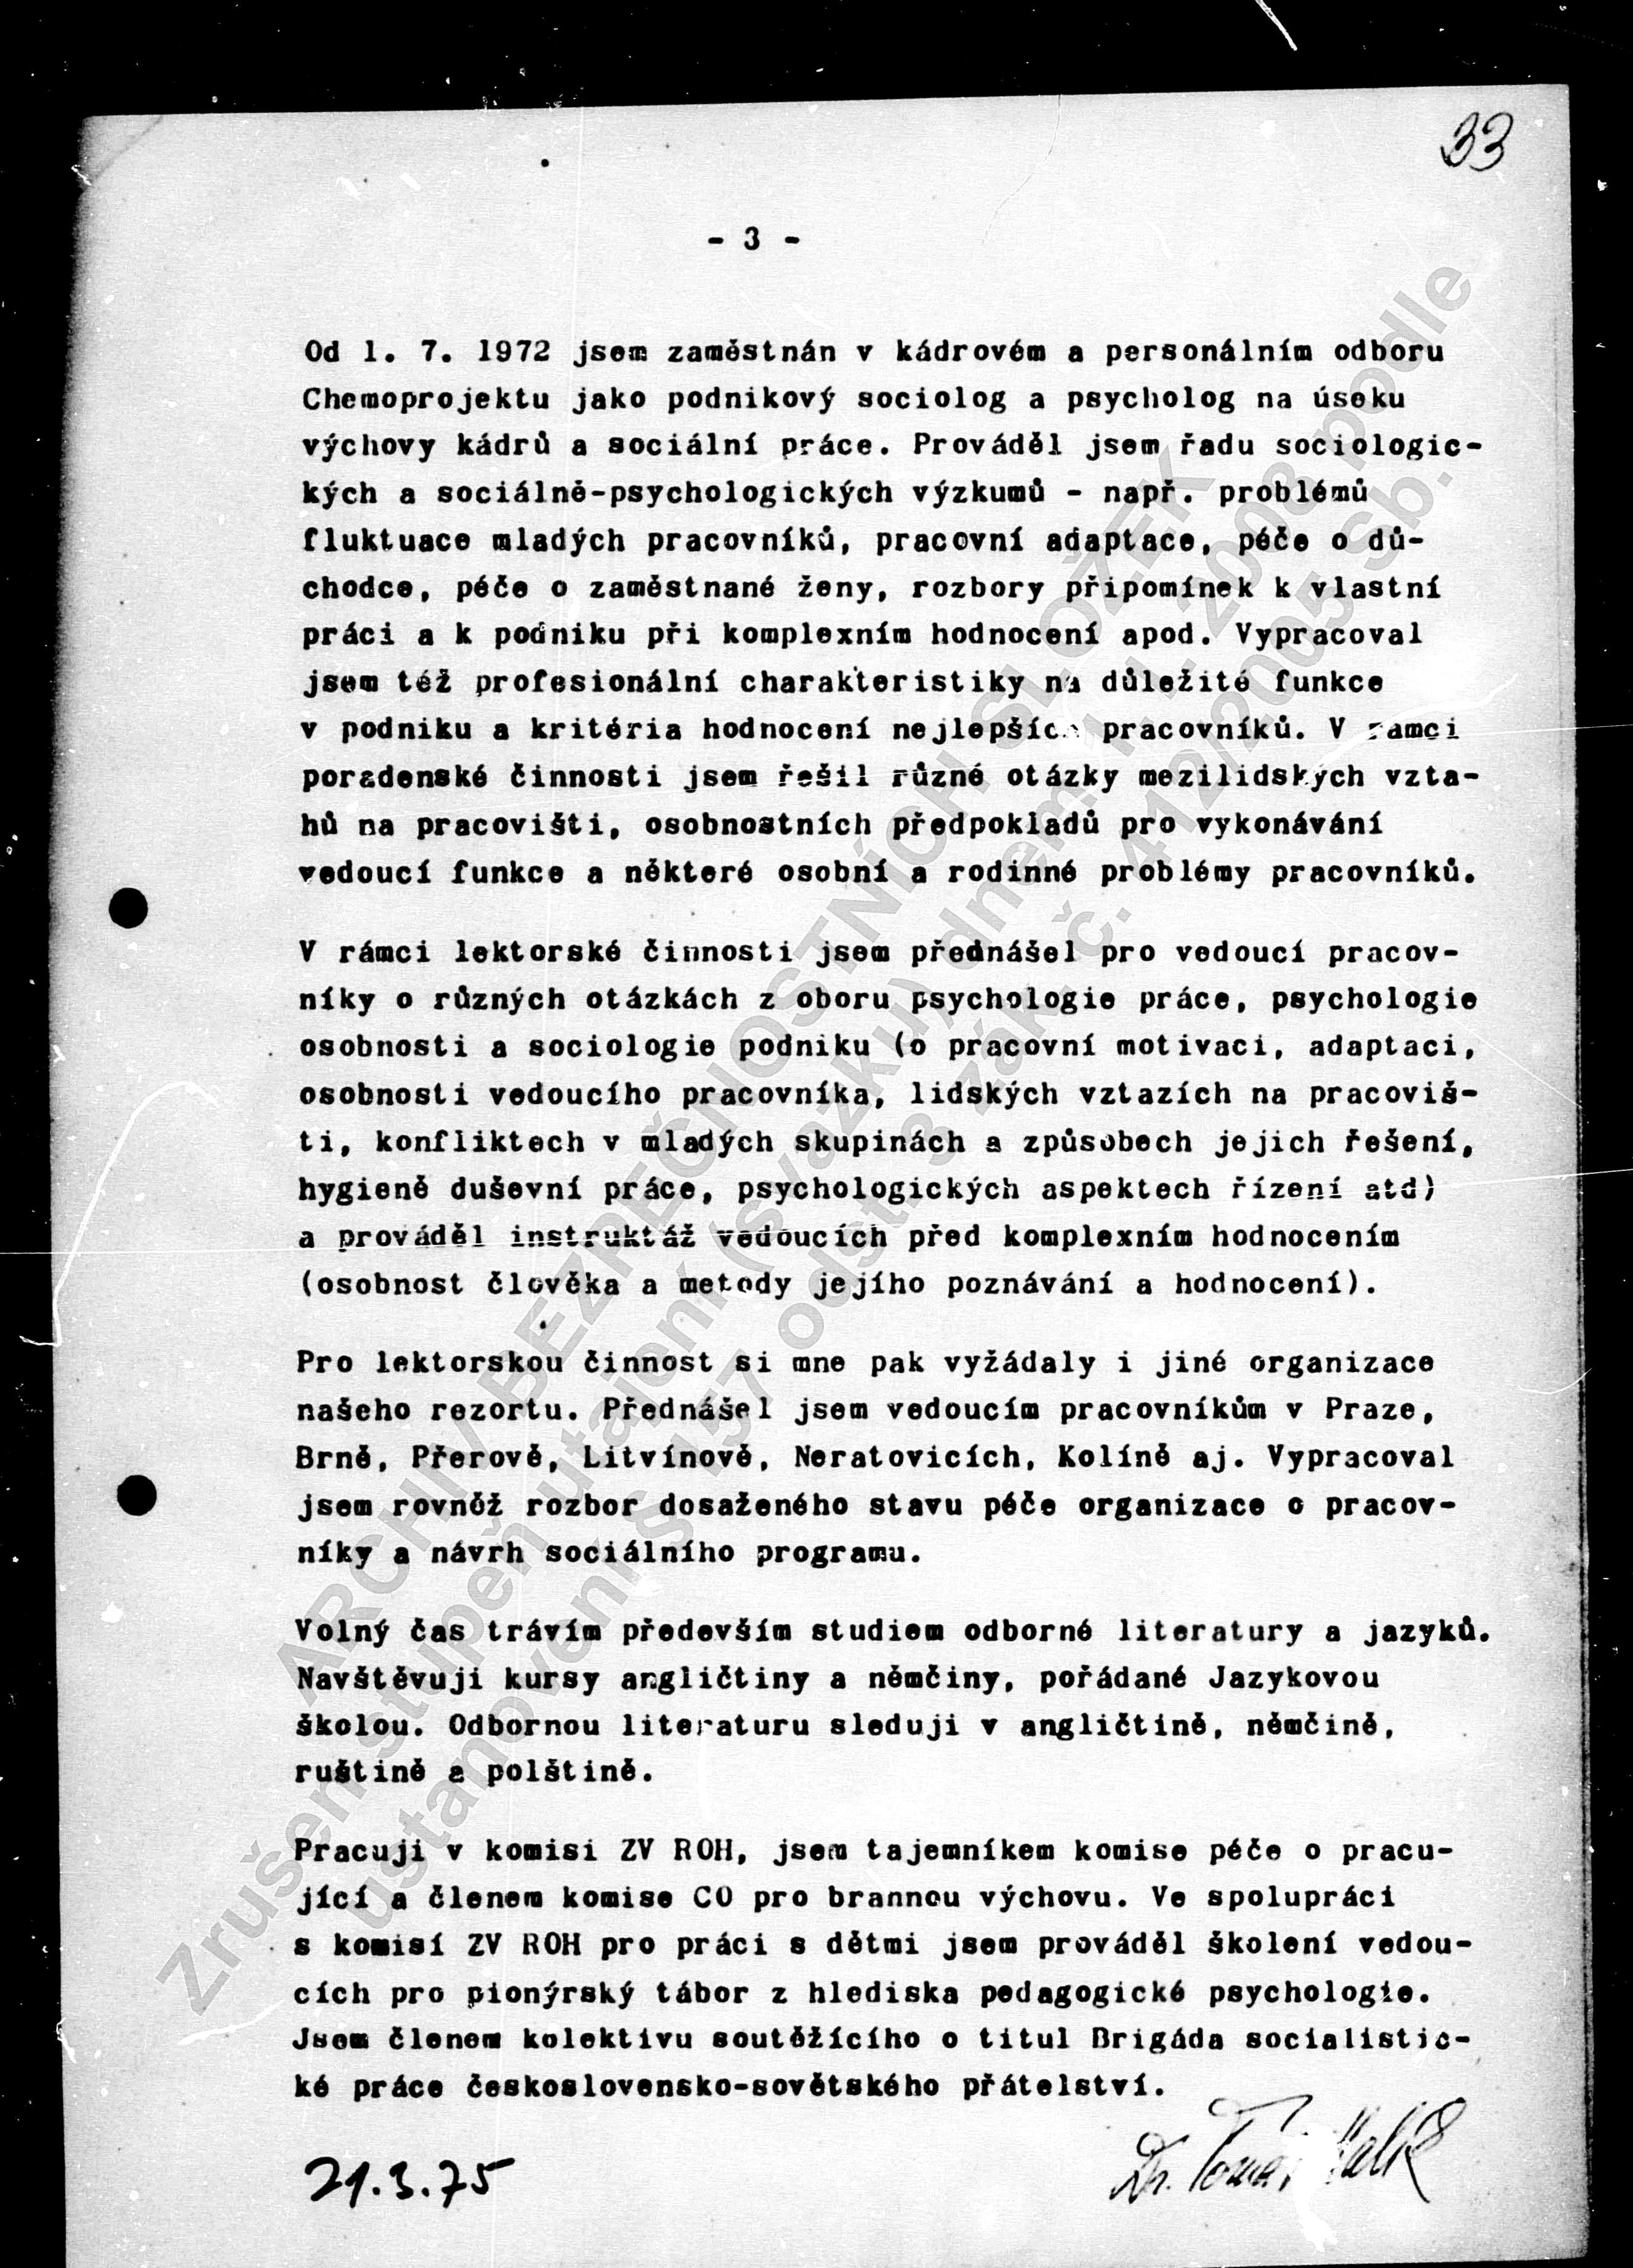 Halikuv Usvedcujici Vlastnorucne Podepsany Zivotopis Daniel Solis